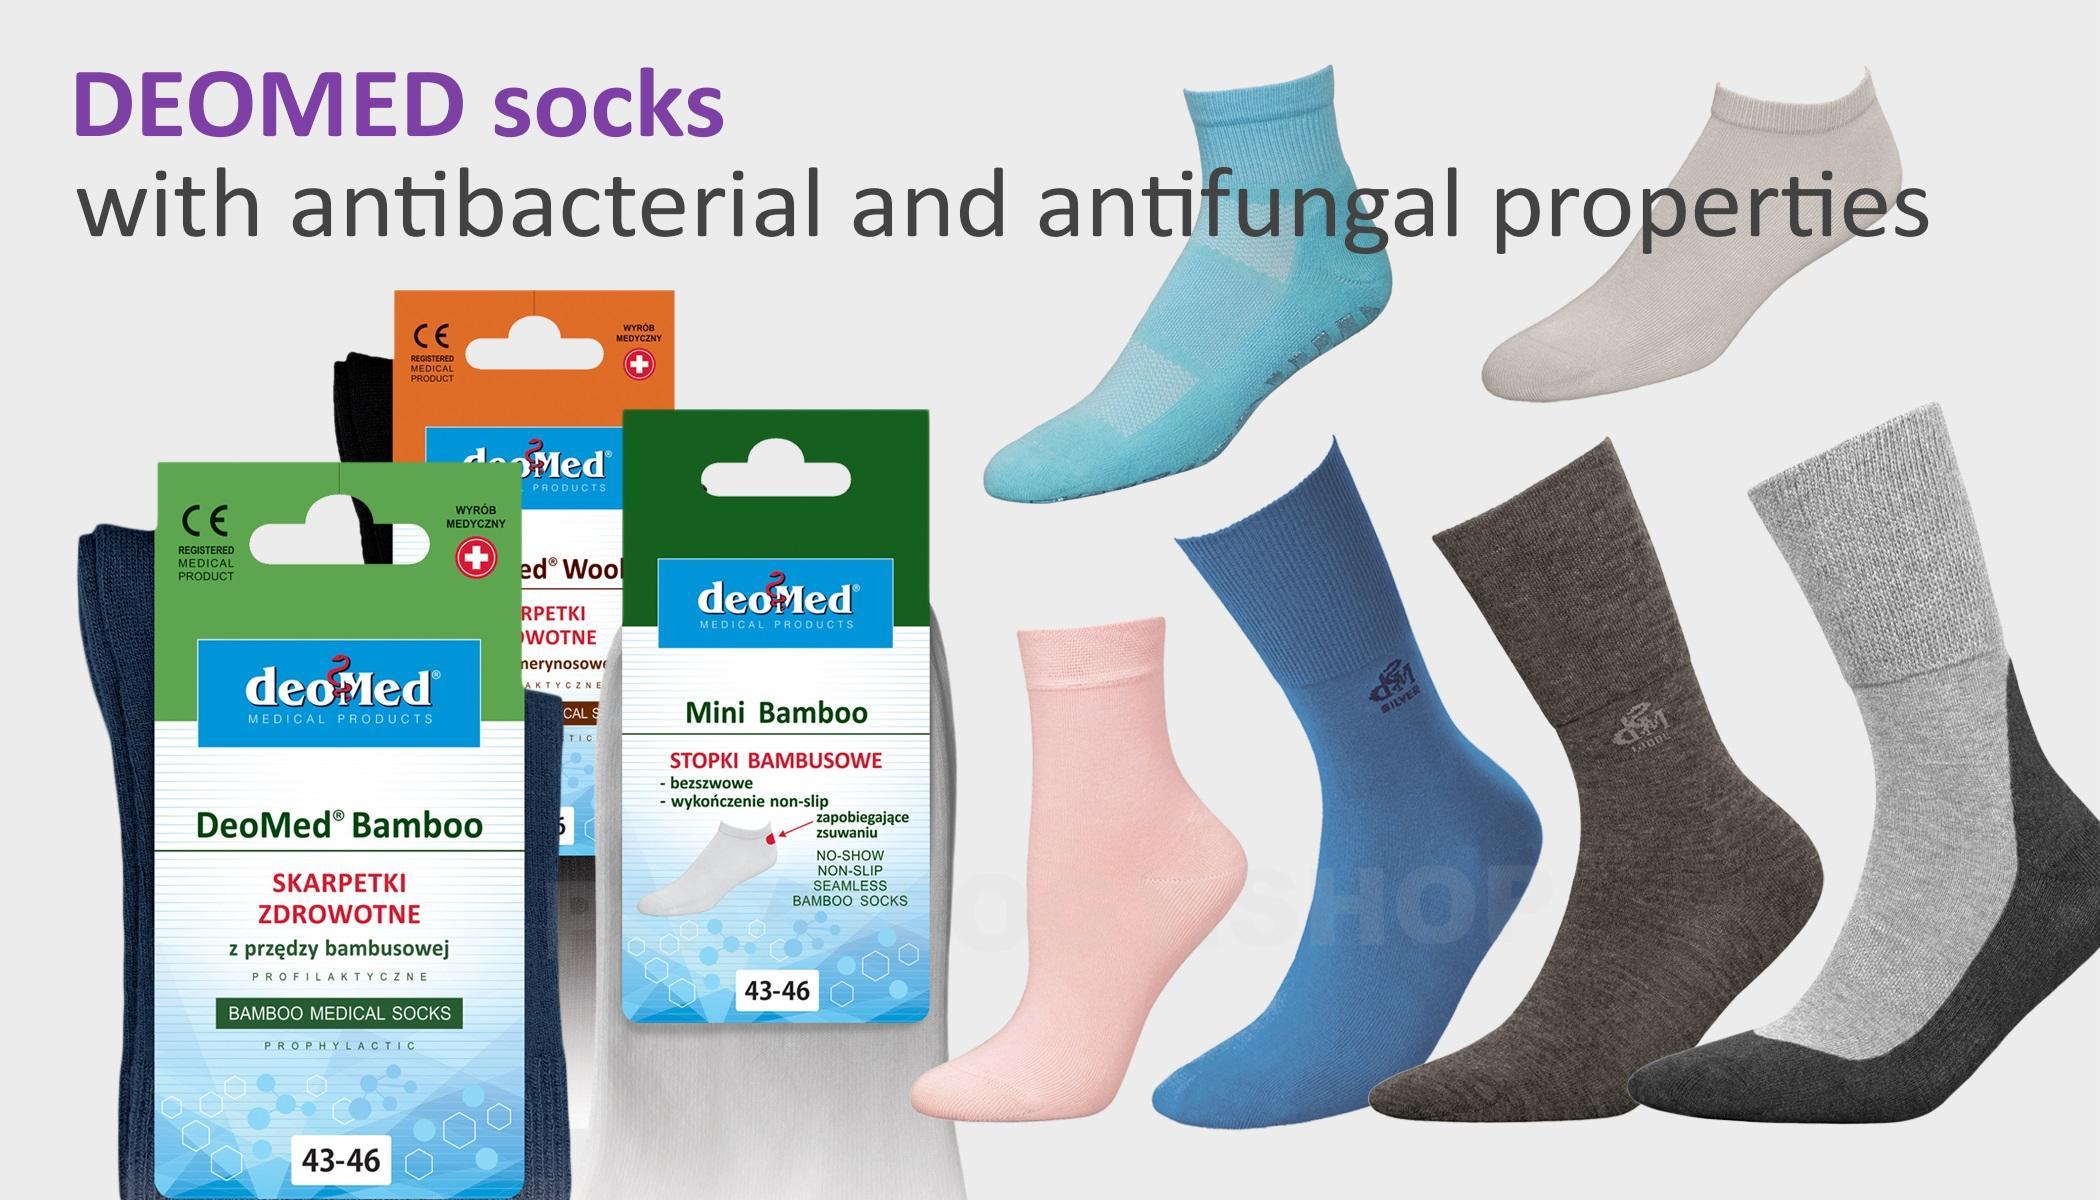 socks with antibacterial and antifungal properties